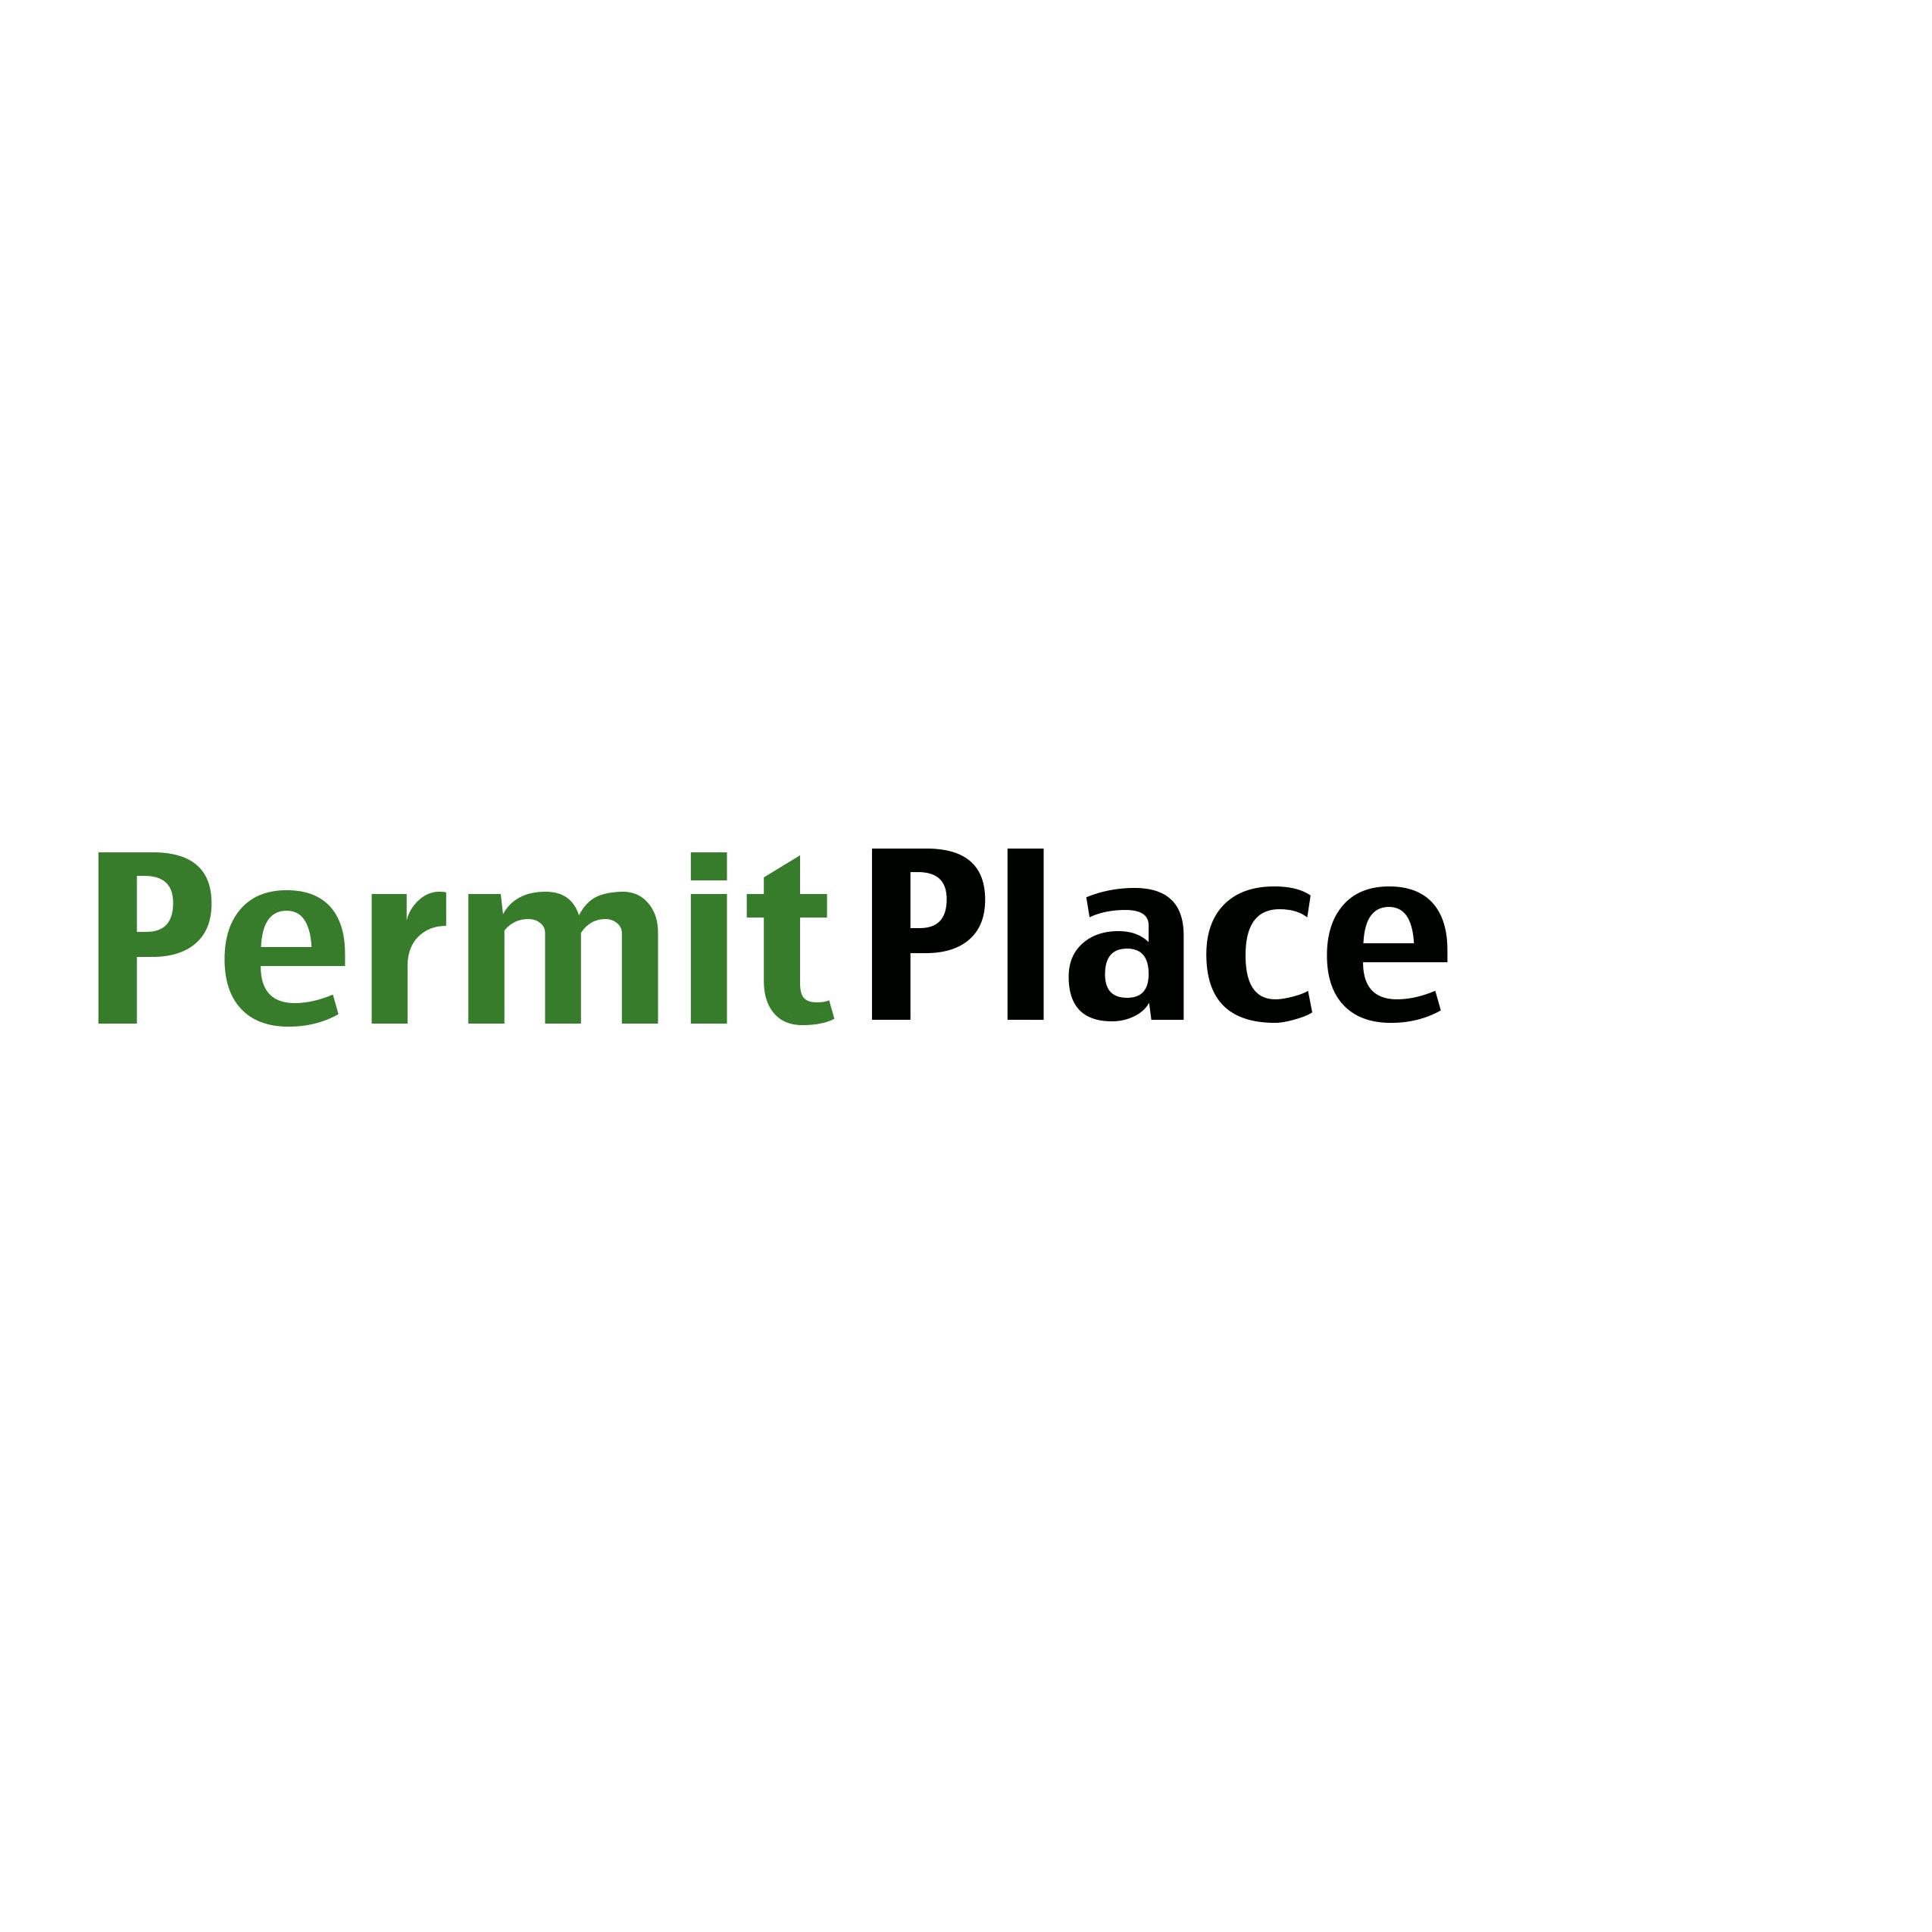 Permit Place